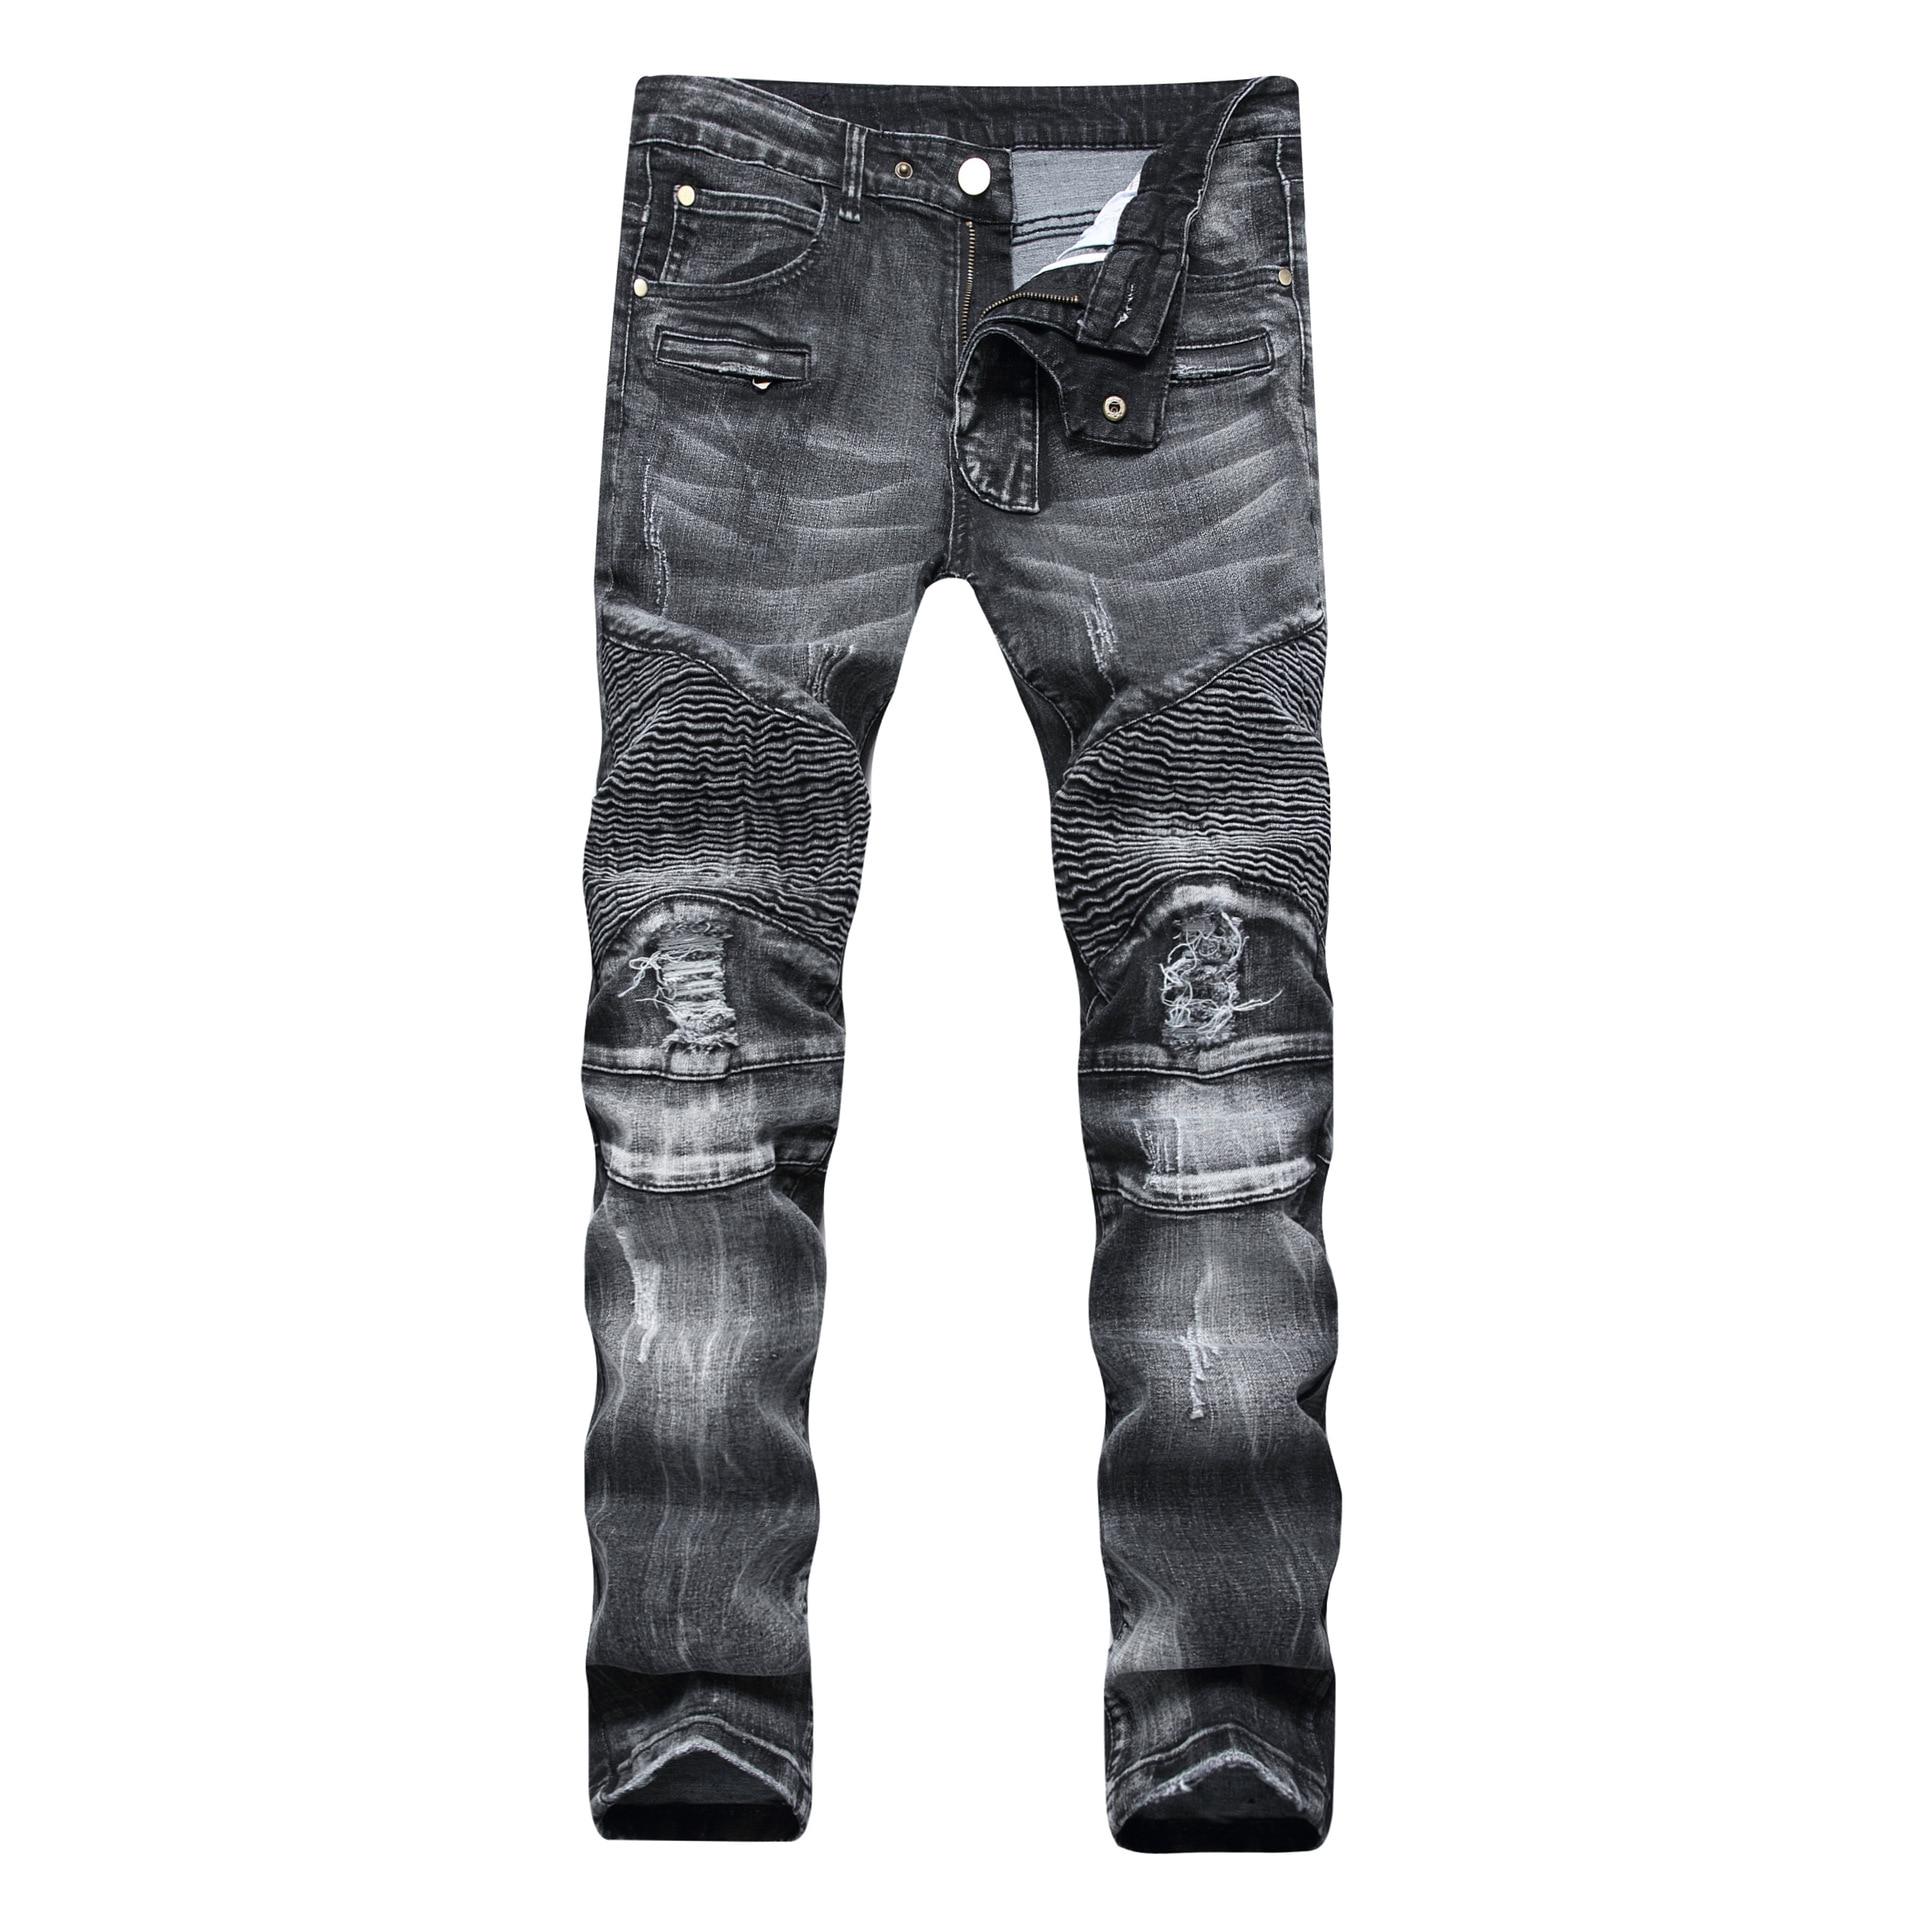 Trade Classic Retro Jeans Men Straight Slim Zipper Decoration Light Fold Skinny Denim Pants Fashion Stretch Hip Hop Jogger Jeans